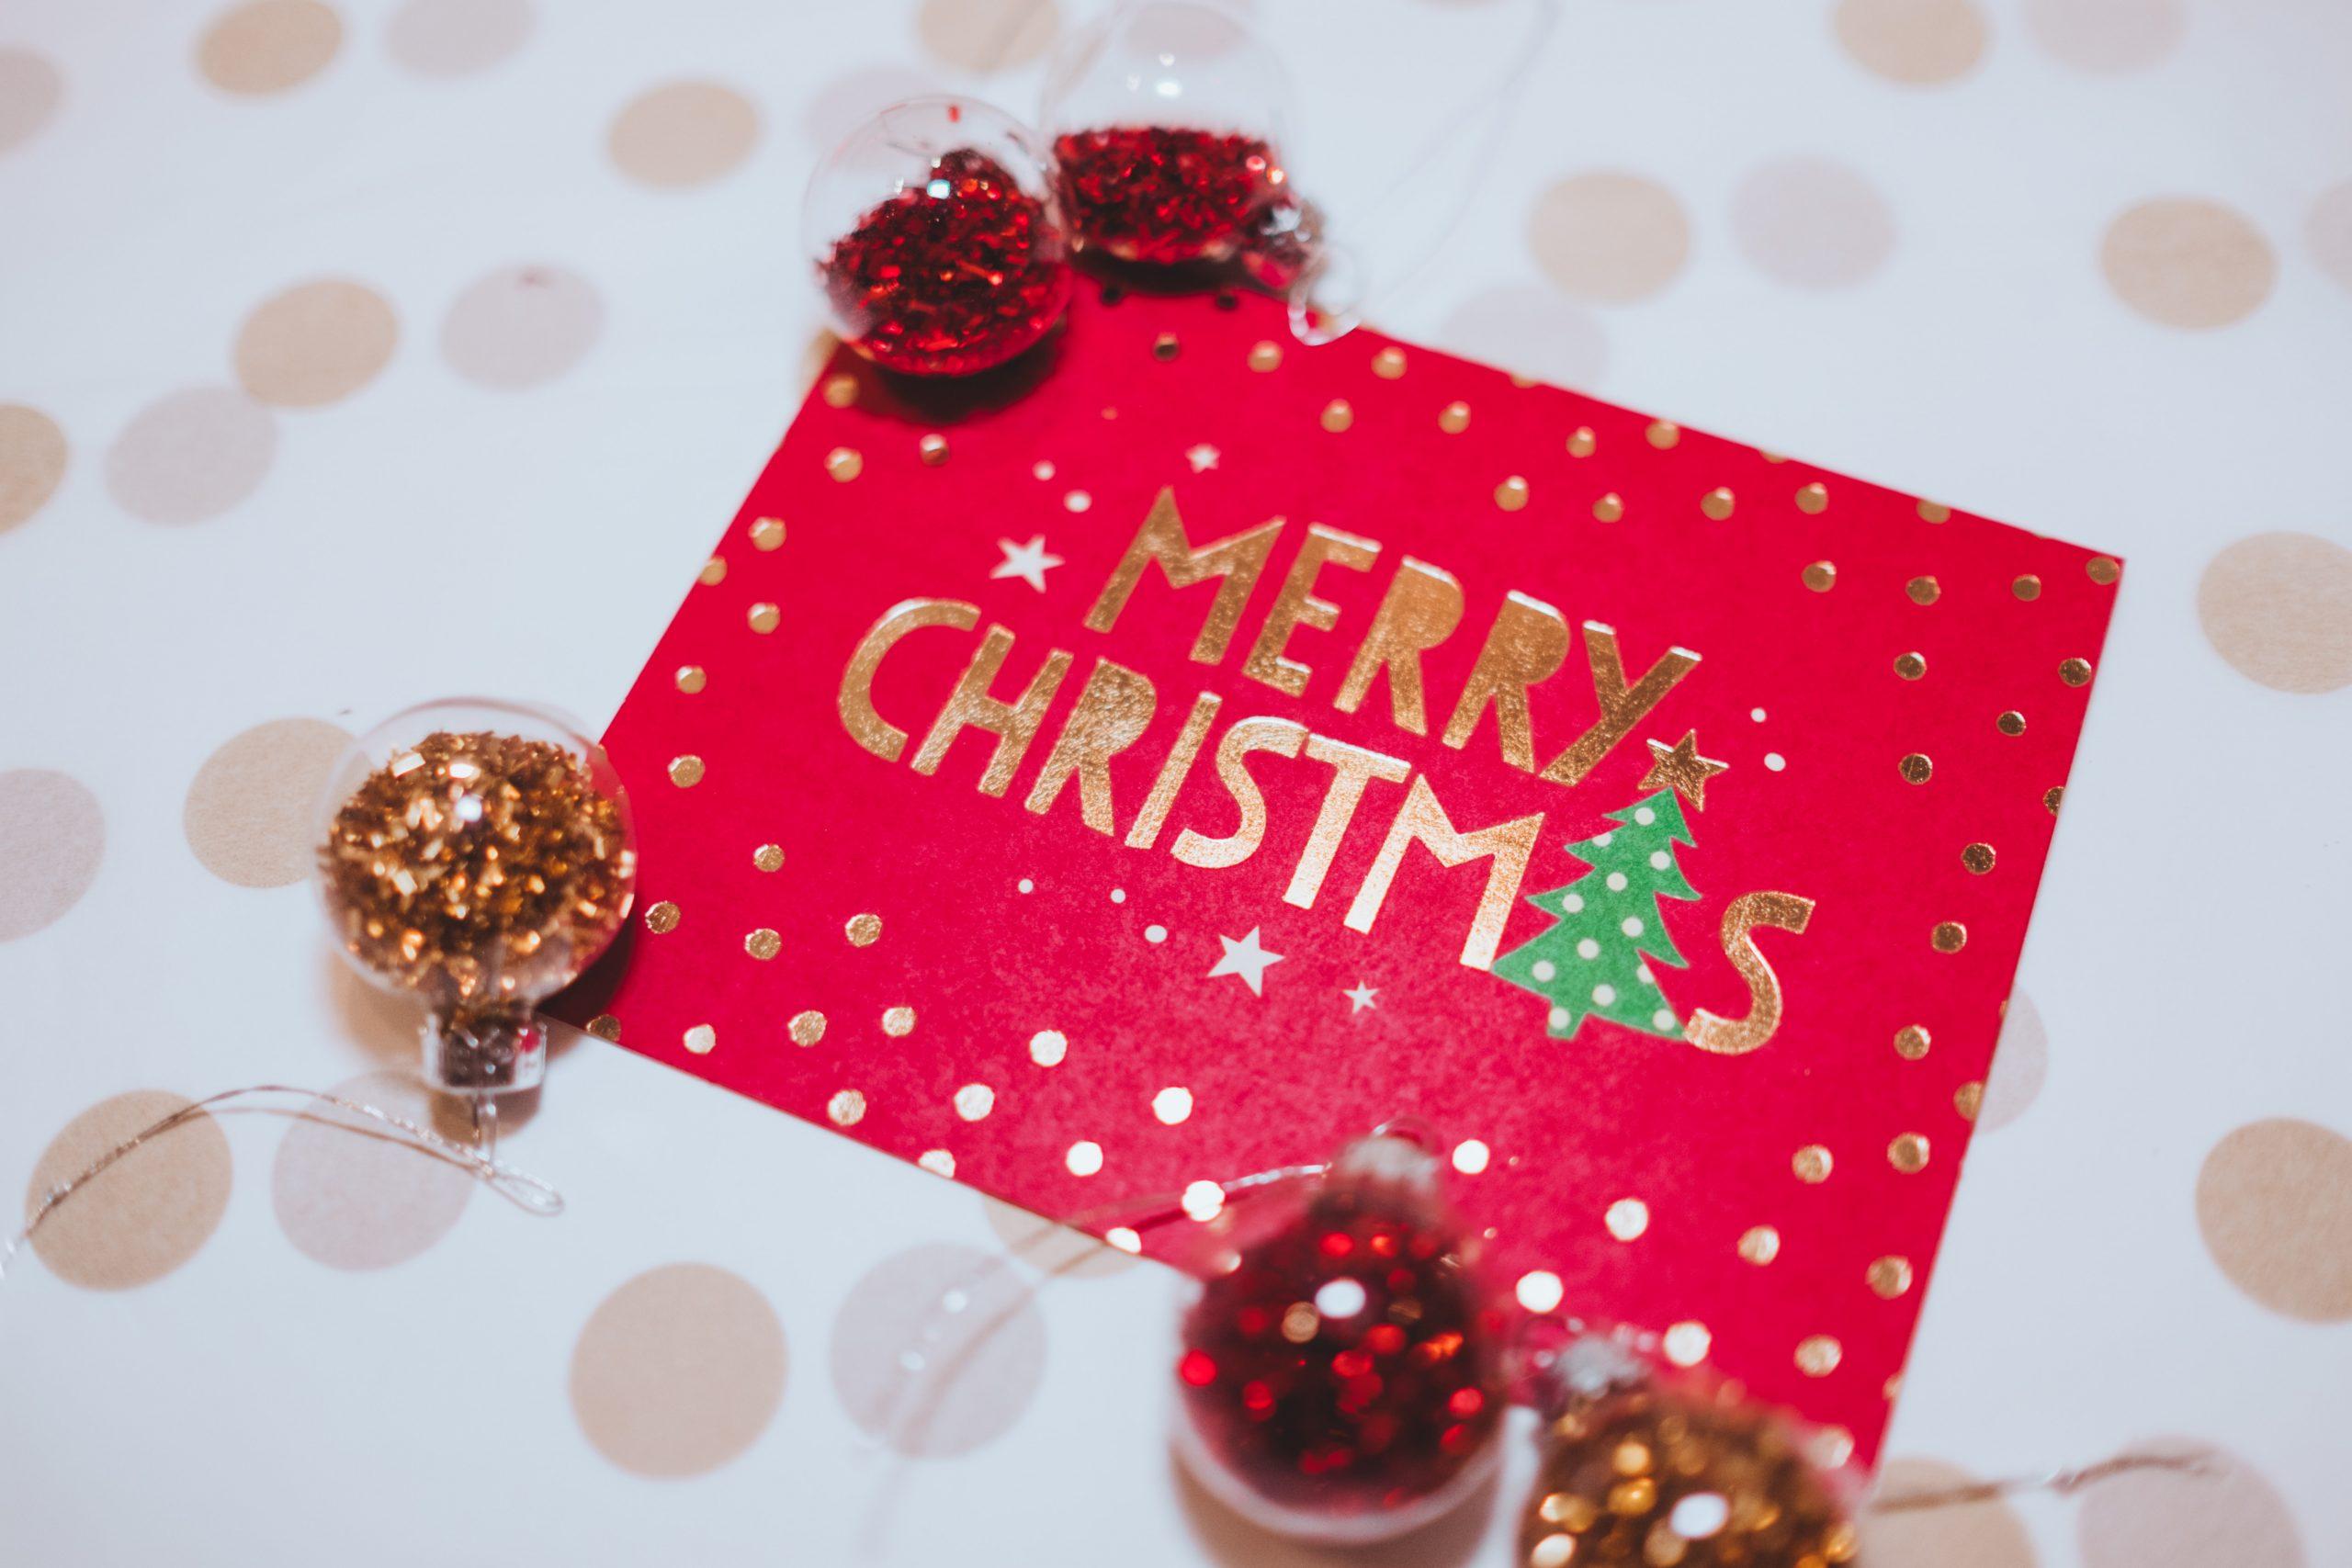 25 December Christmas Celebration